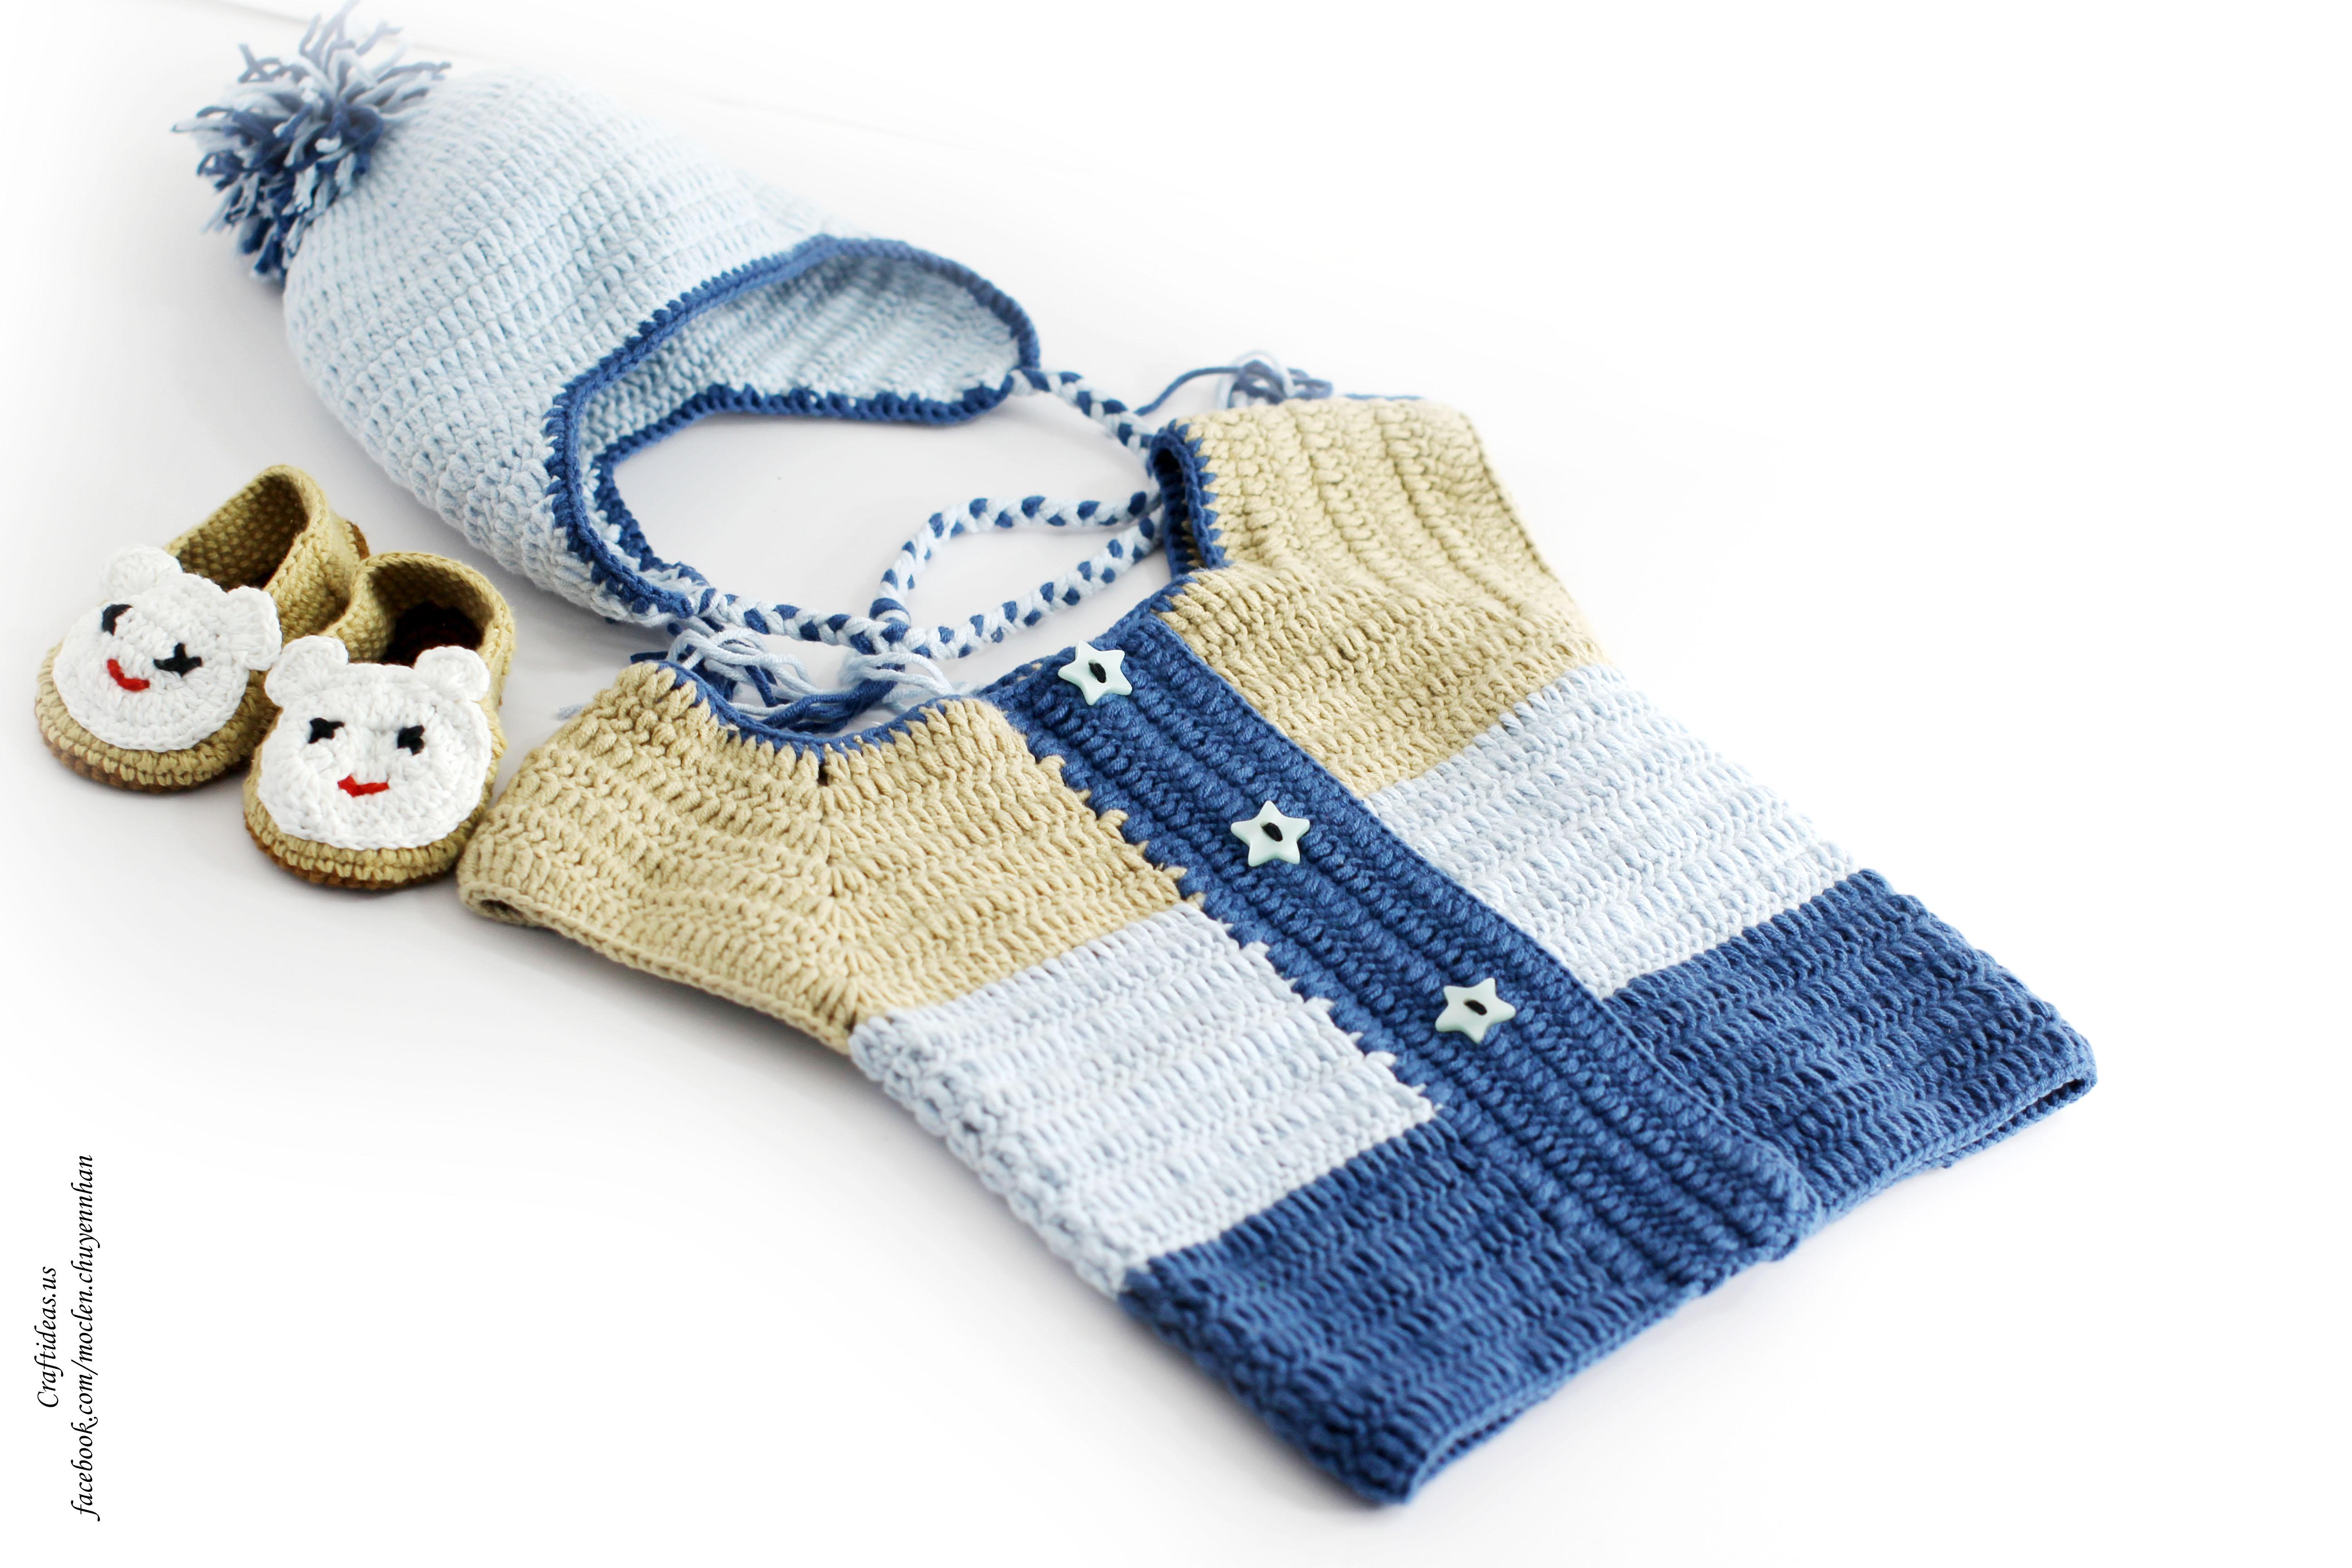 Crochet baby set sweater, hat and booties